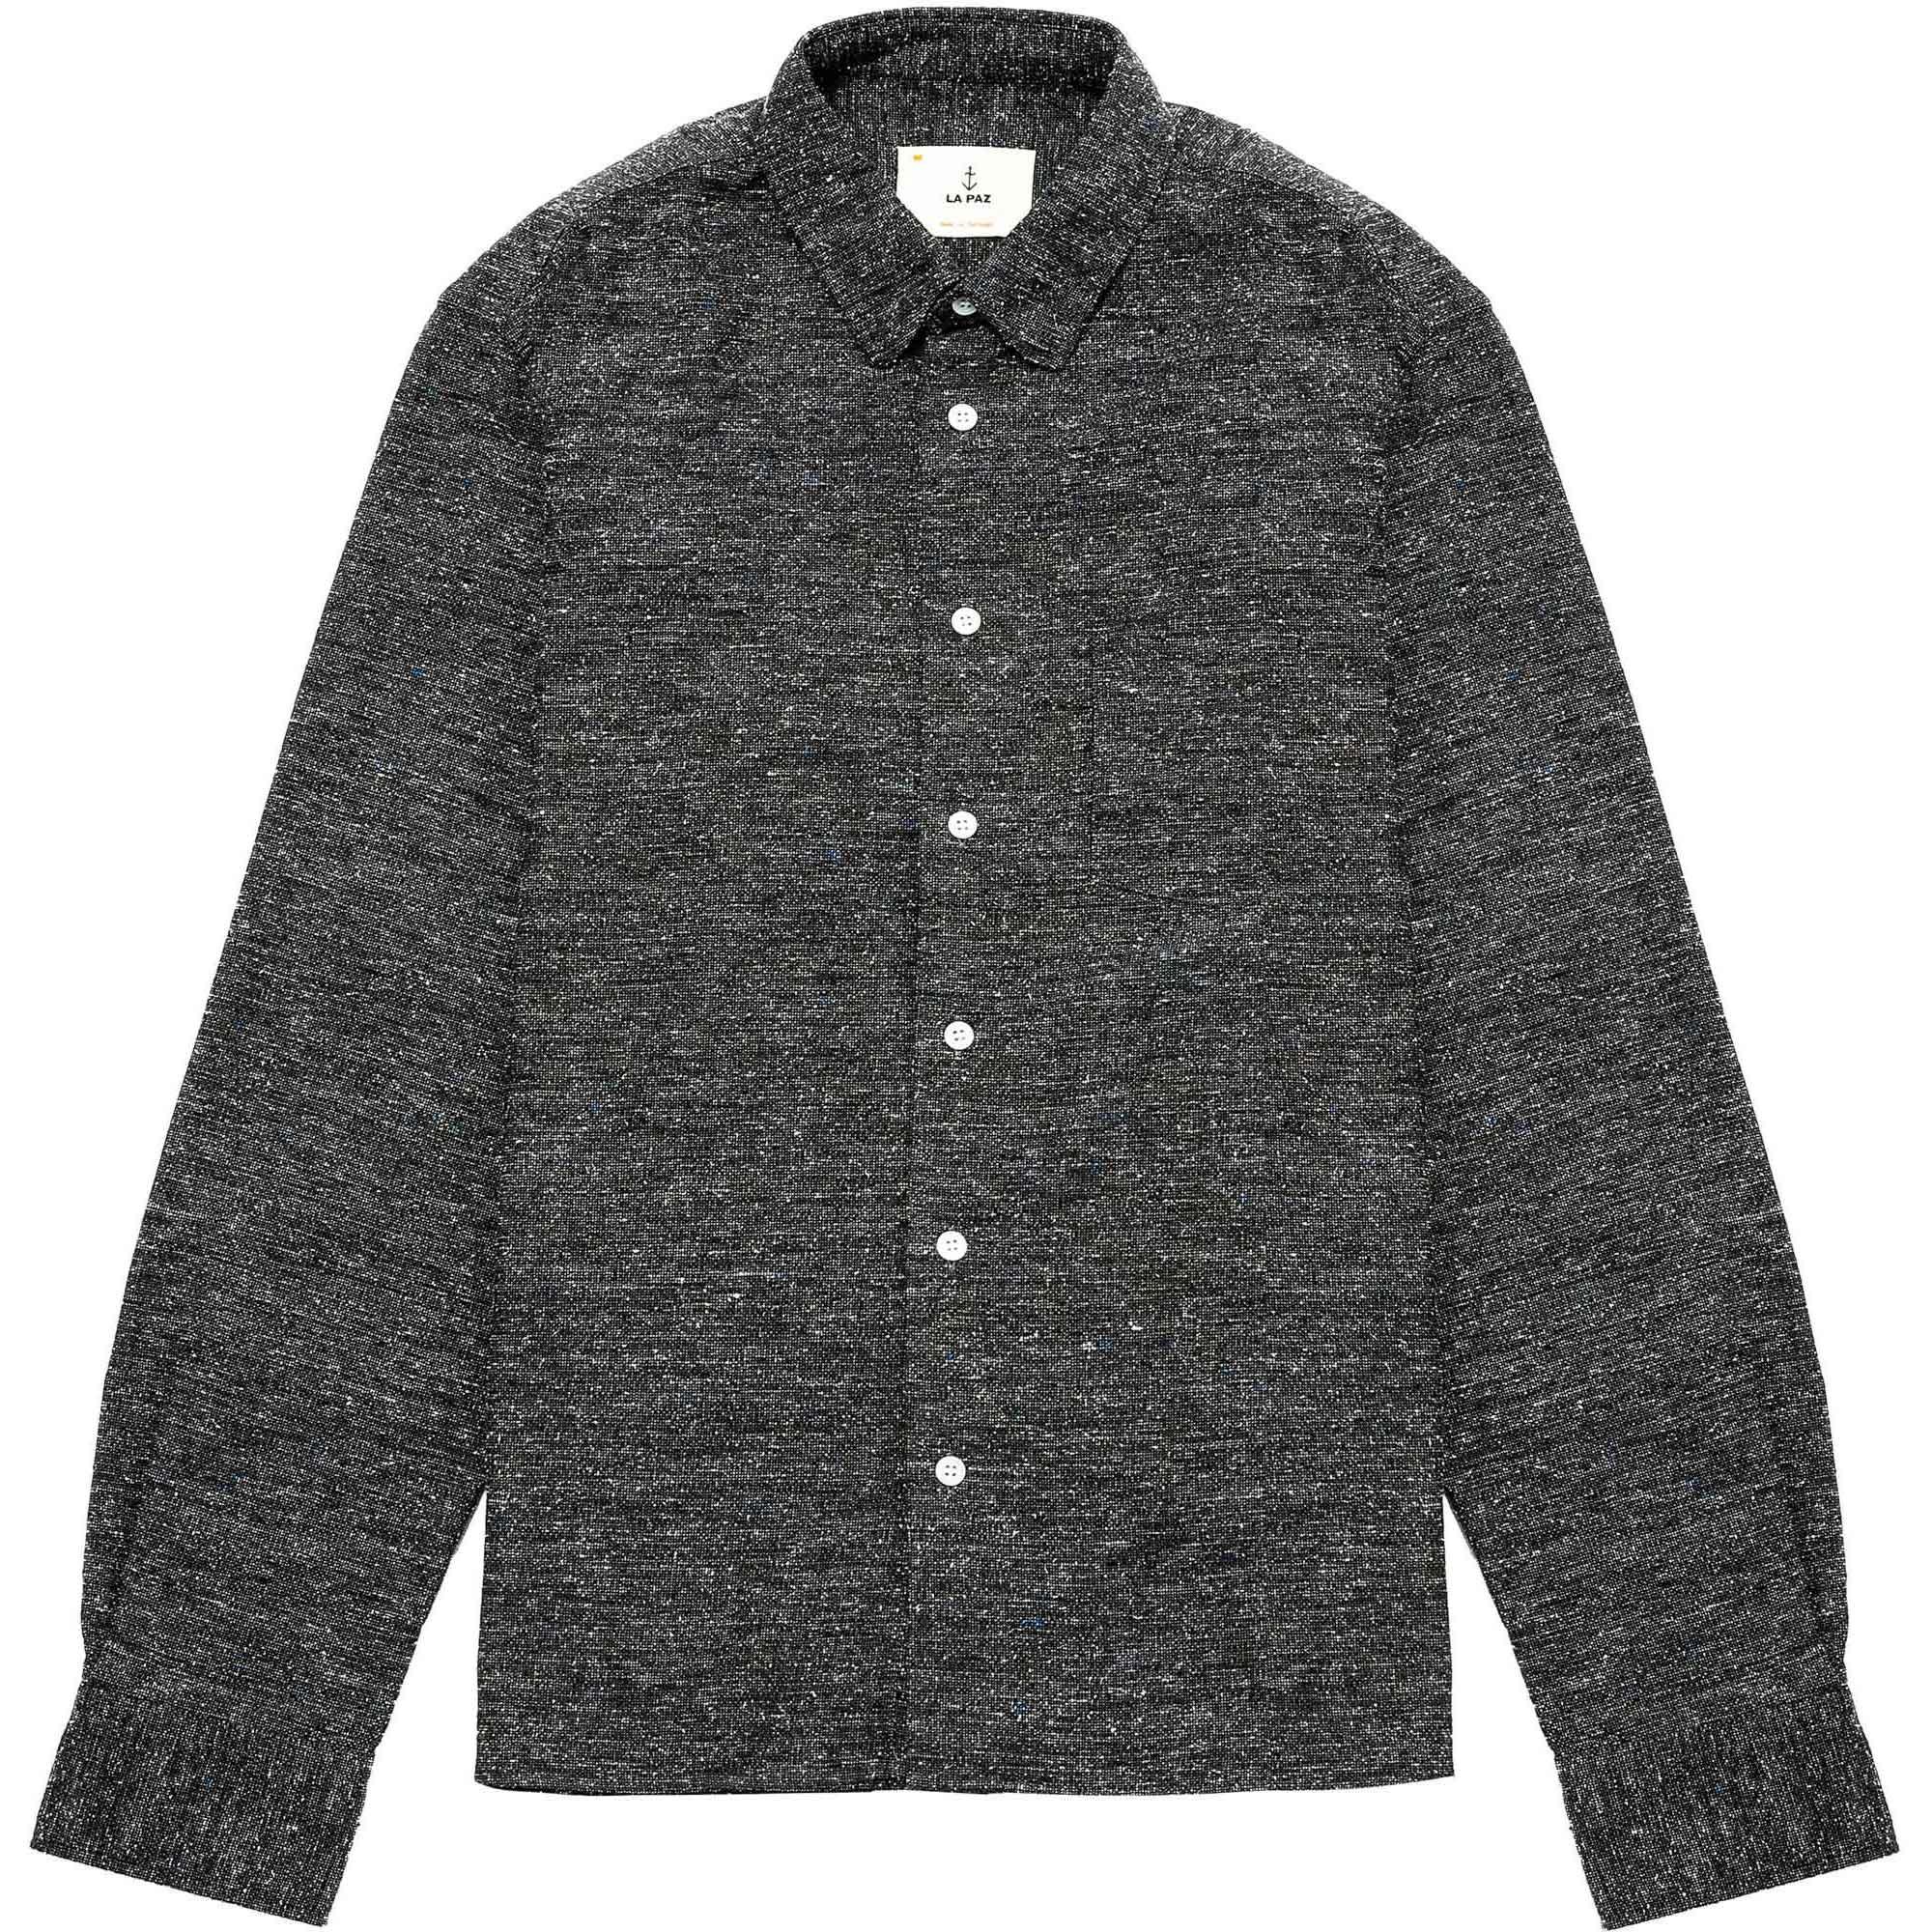 Camisa negra jaspeada